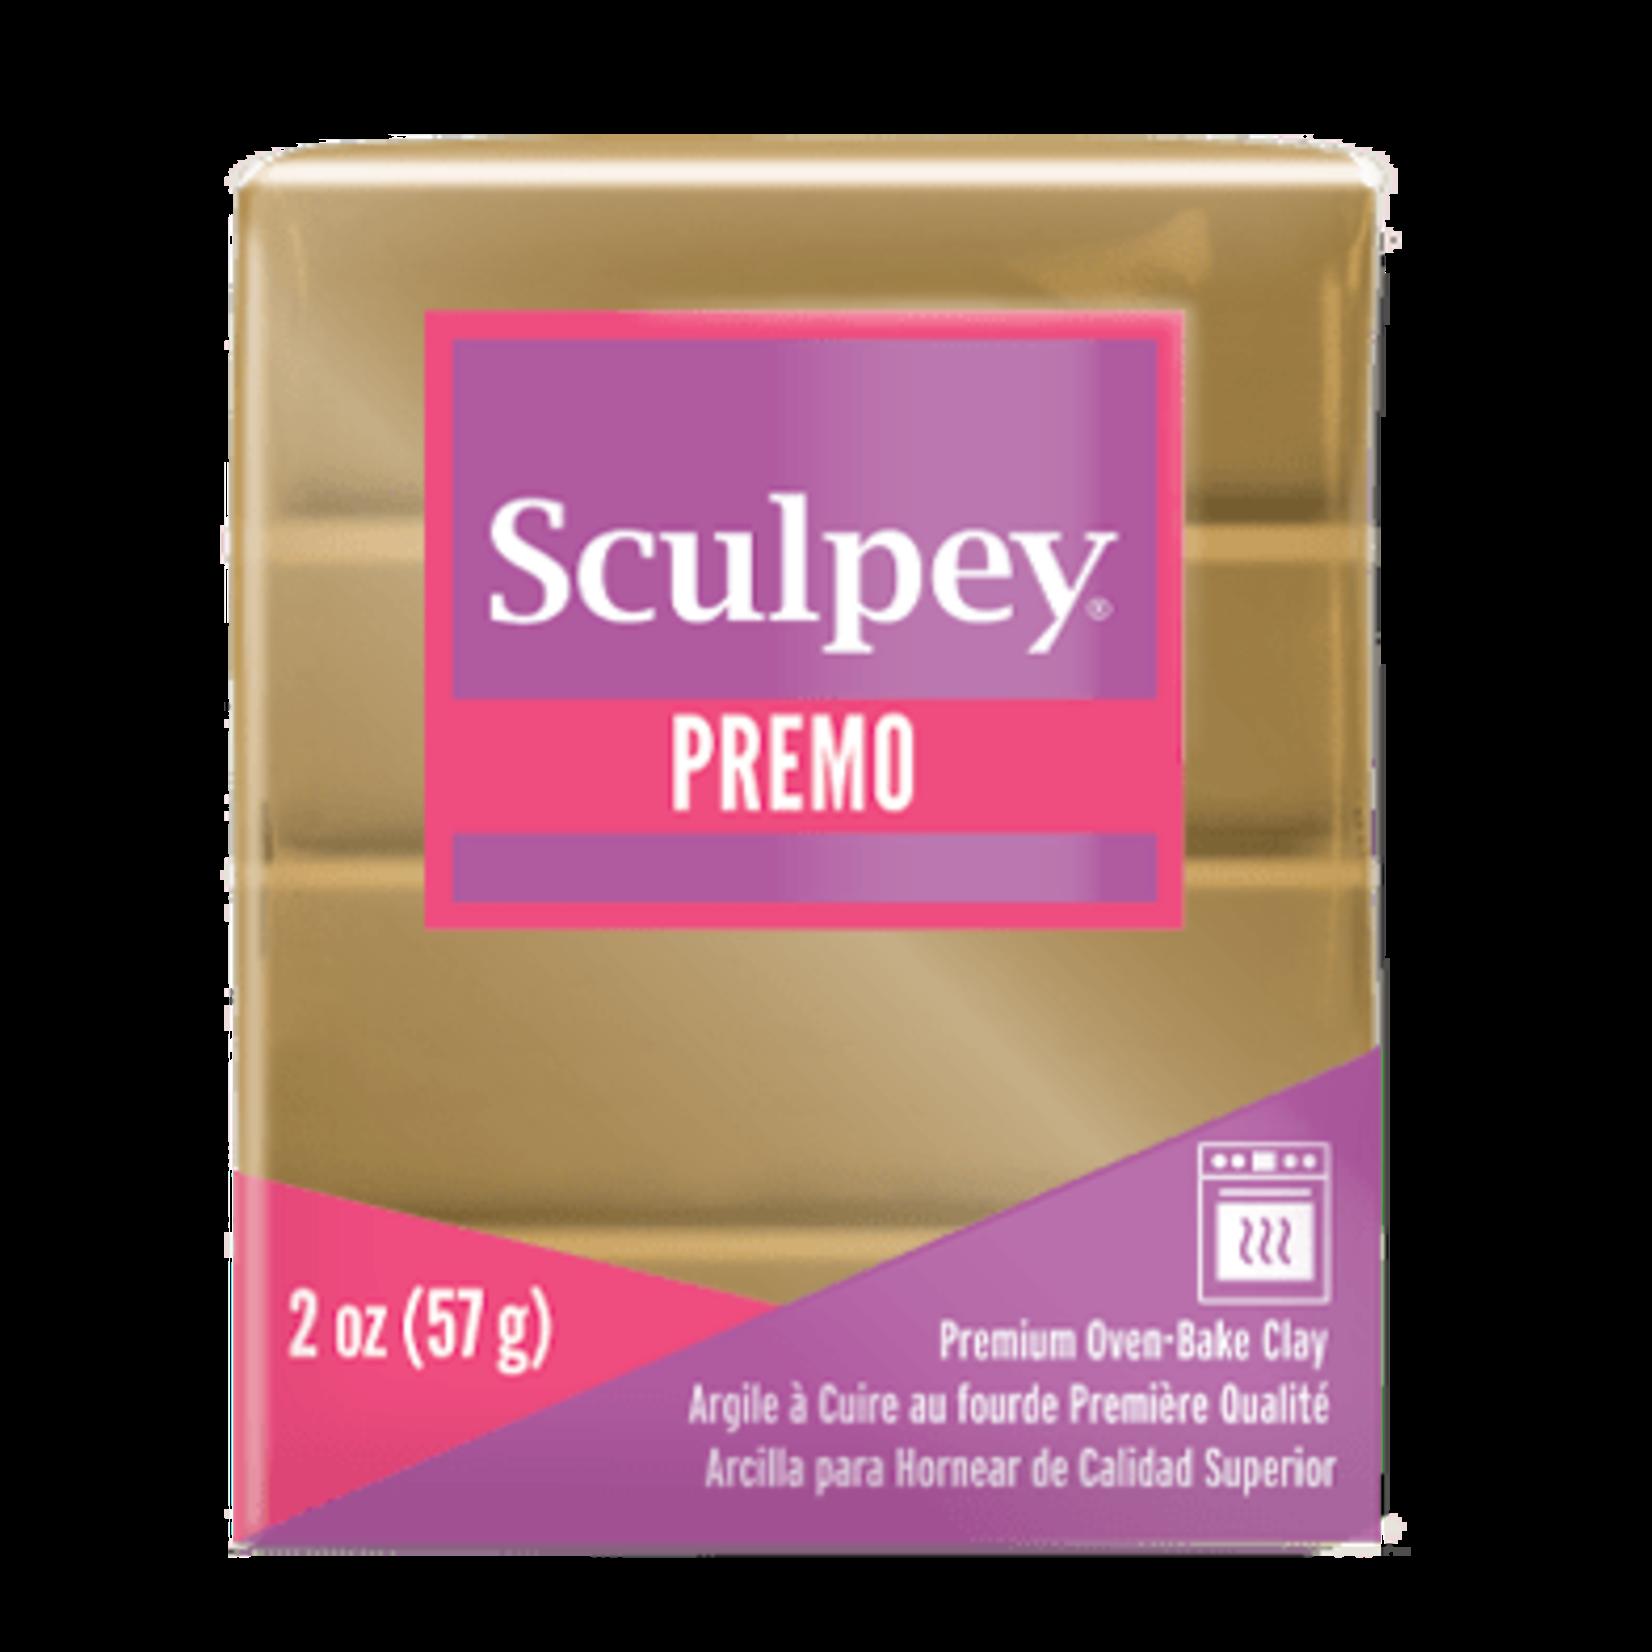 Sculpey Sculpey Premo   -- Antique Gold